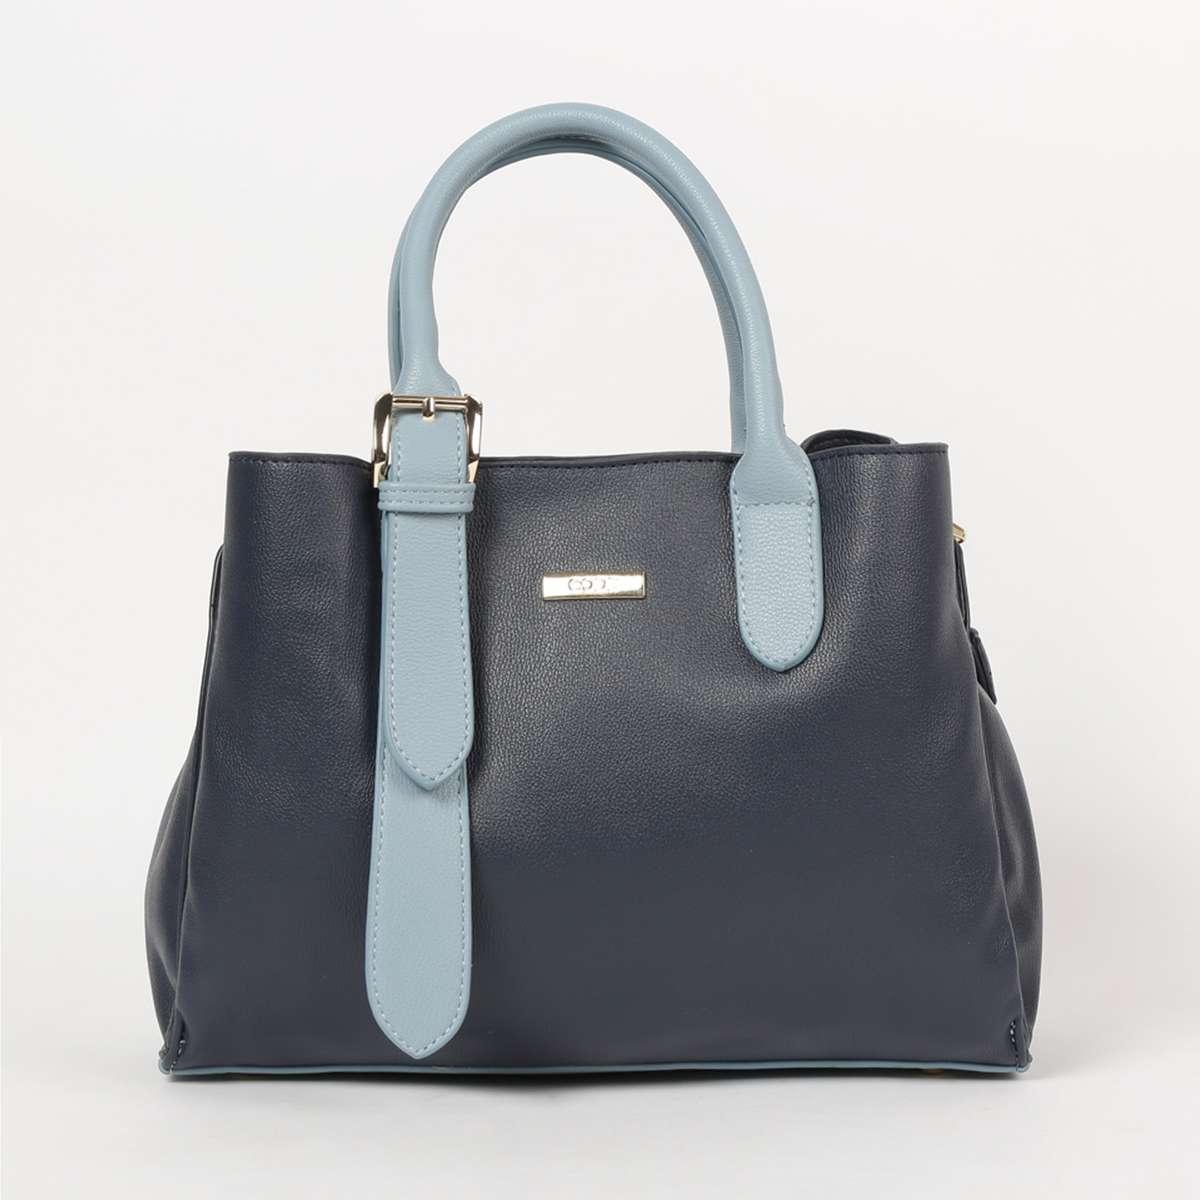 3.CODE Women Solid Snap Button Closure Handbag